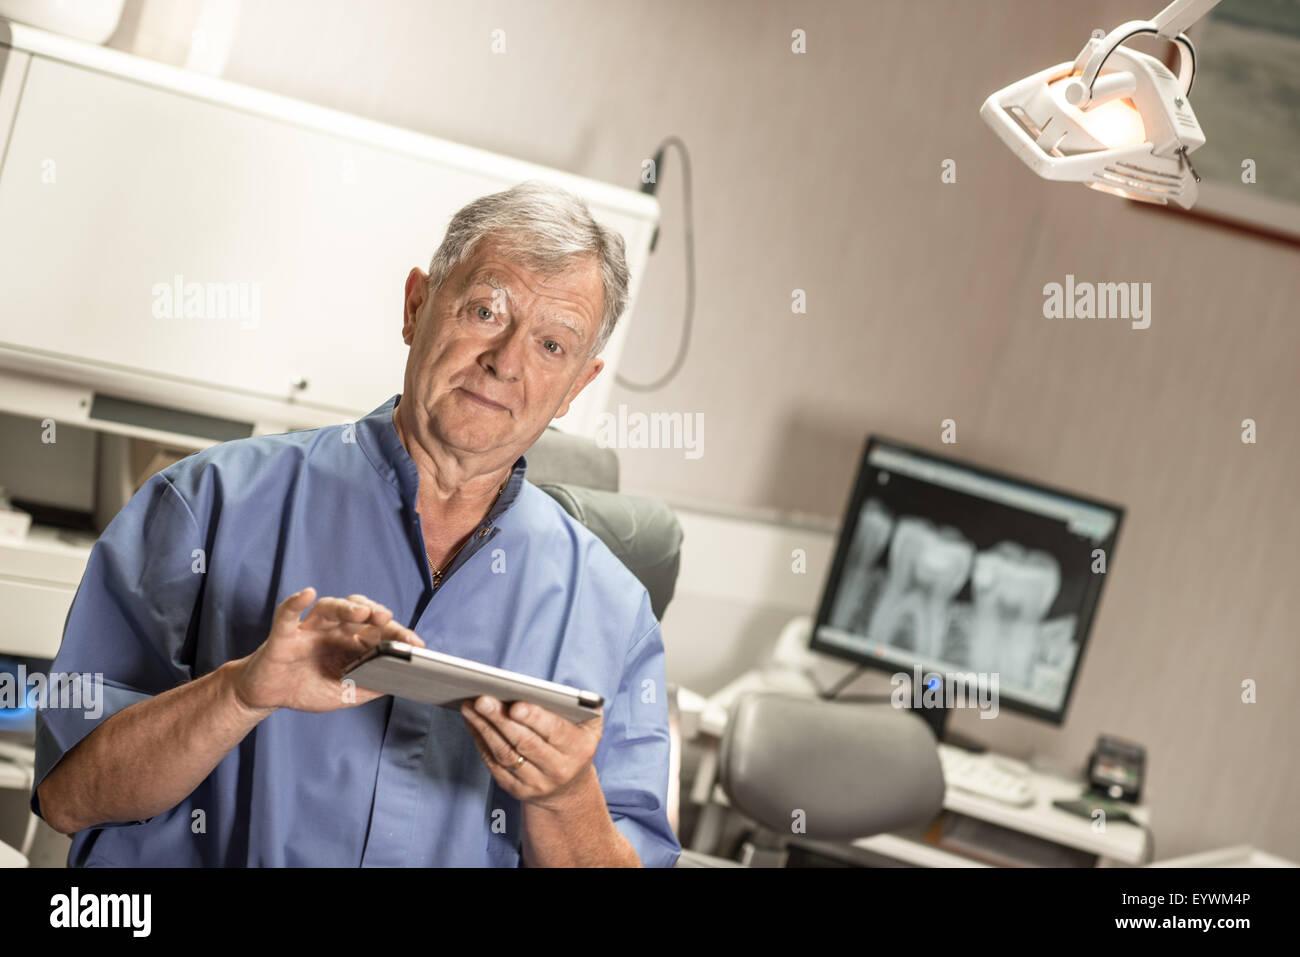 Dentist using digital tablet in office - Stock Image